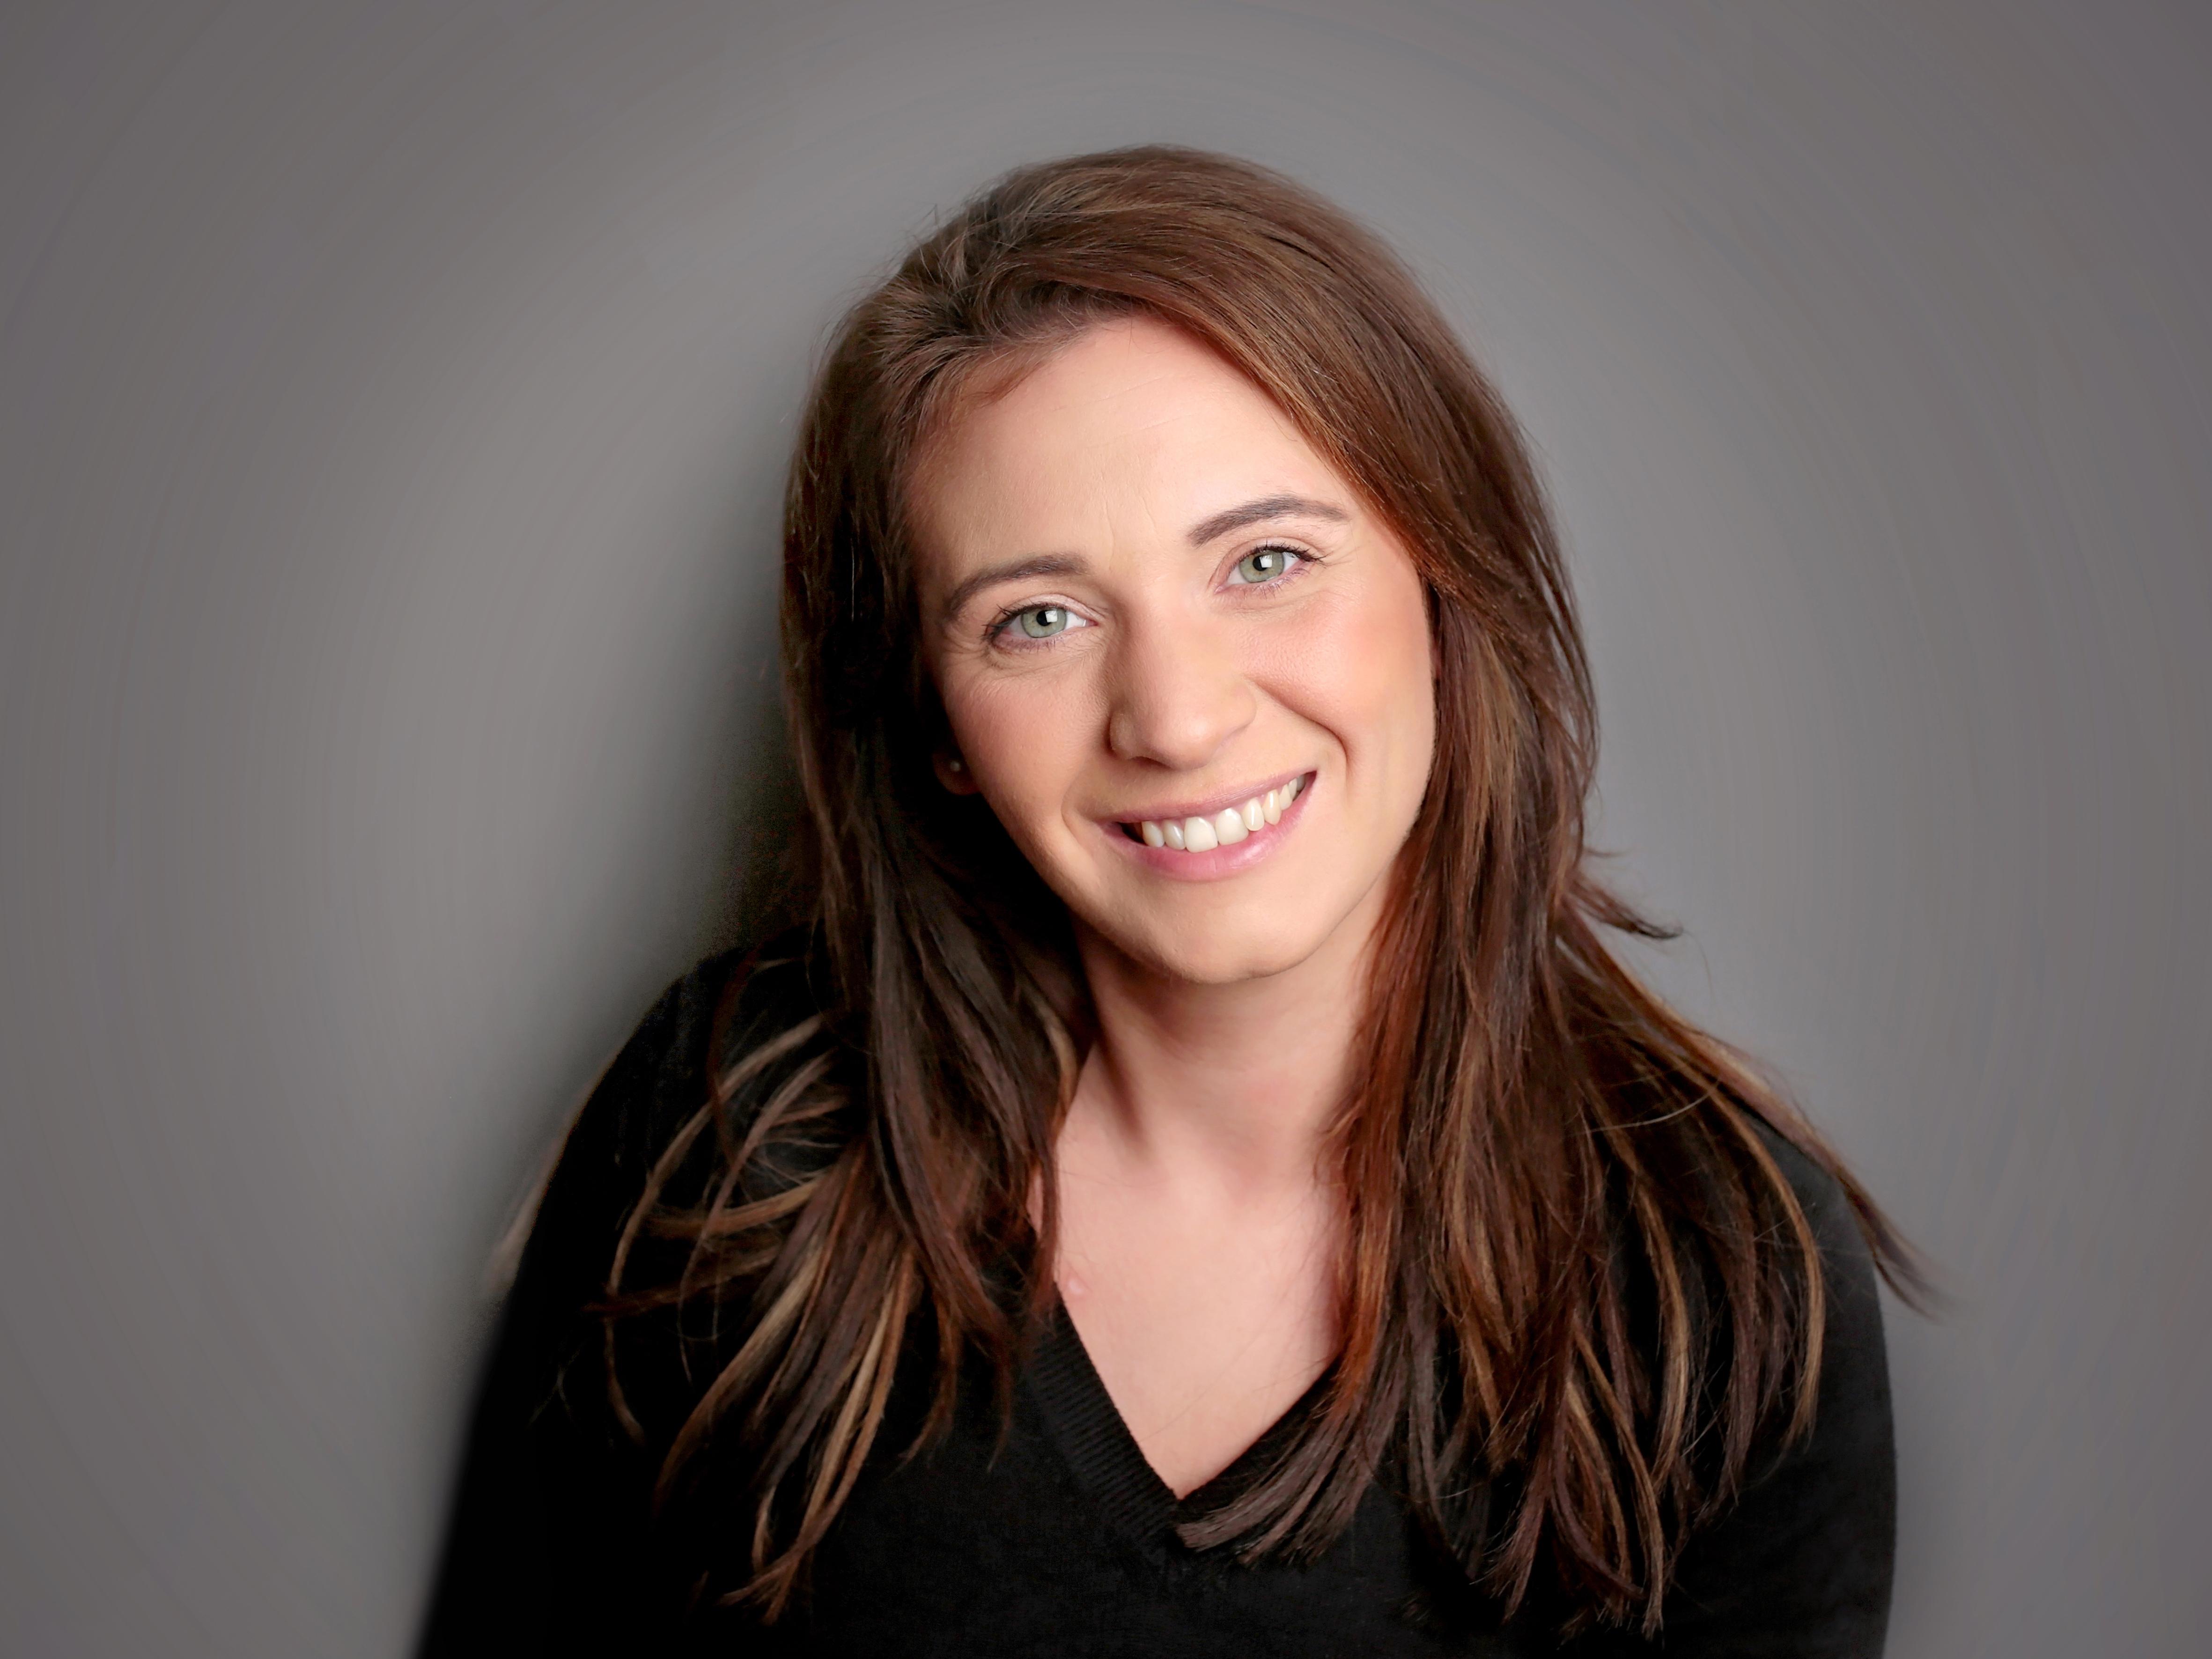 Laura Ranson